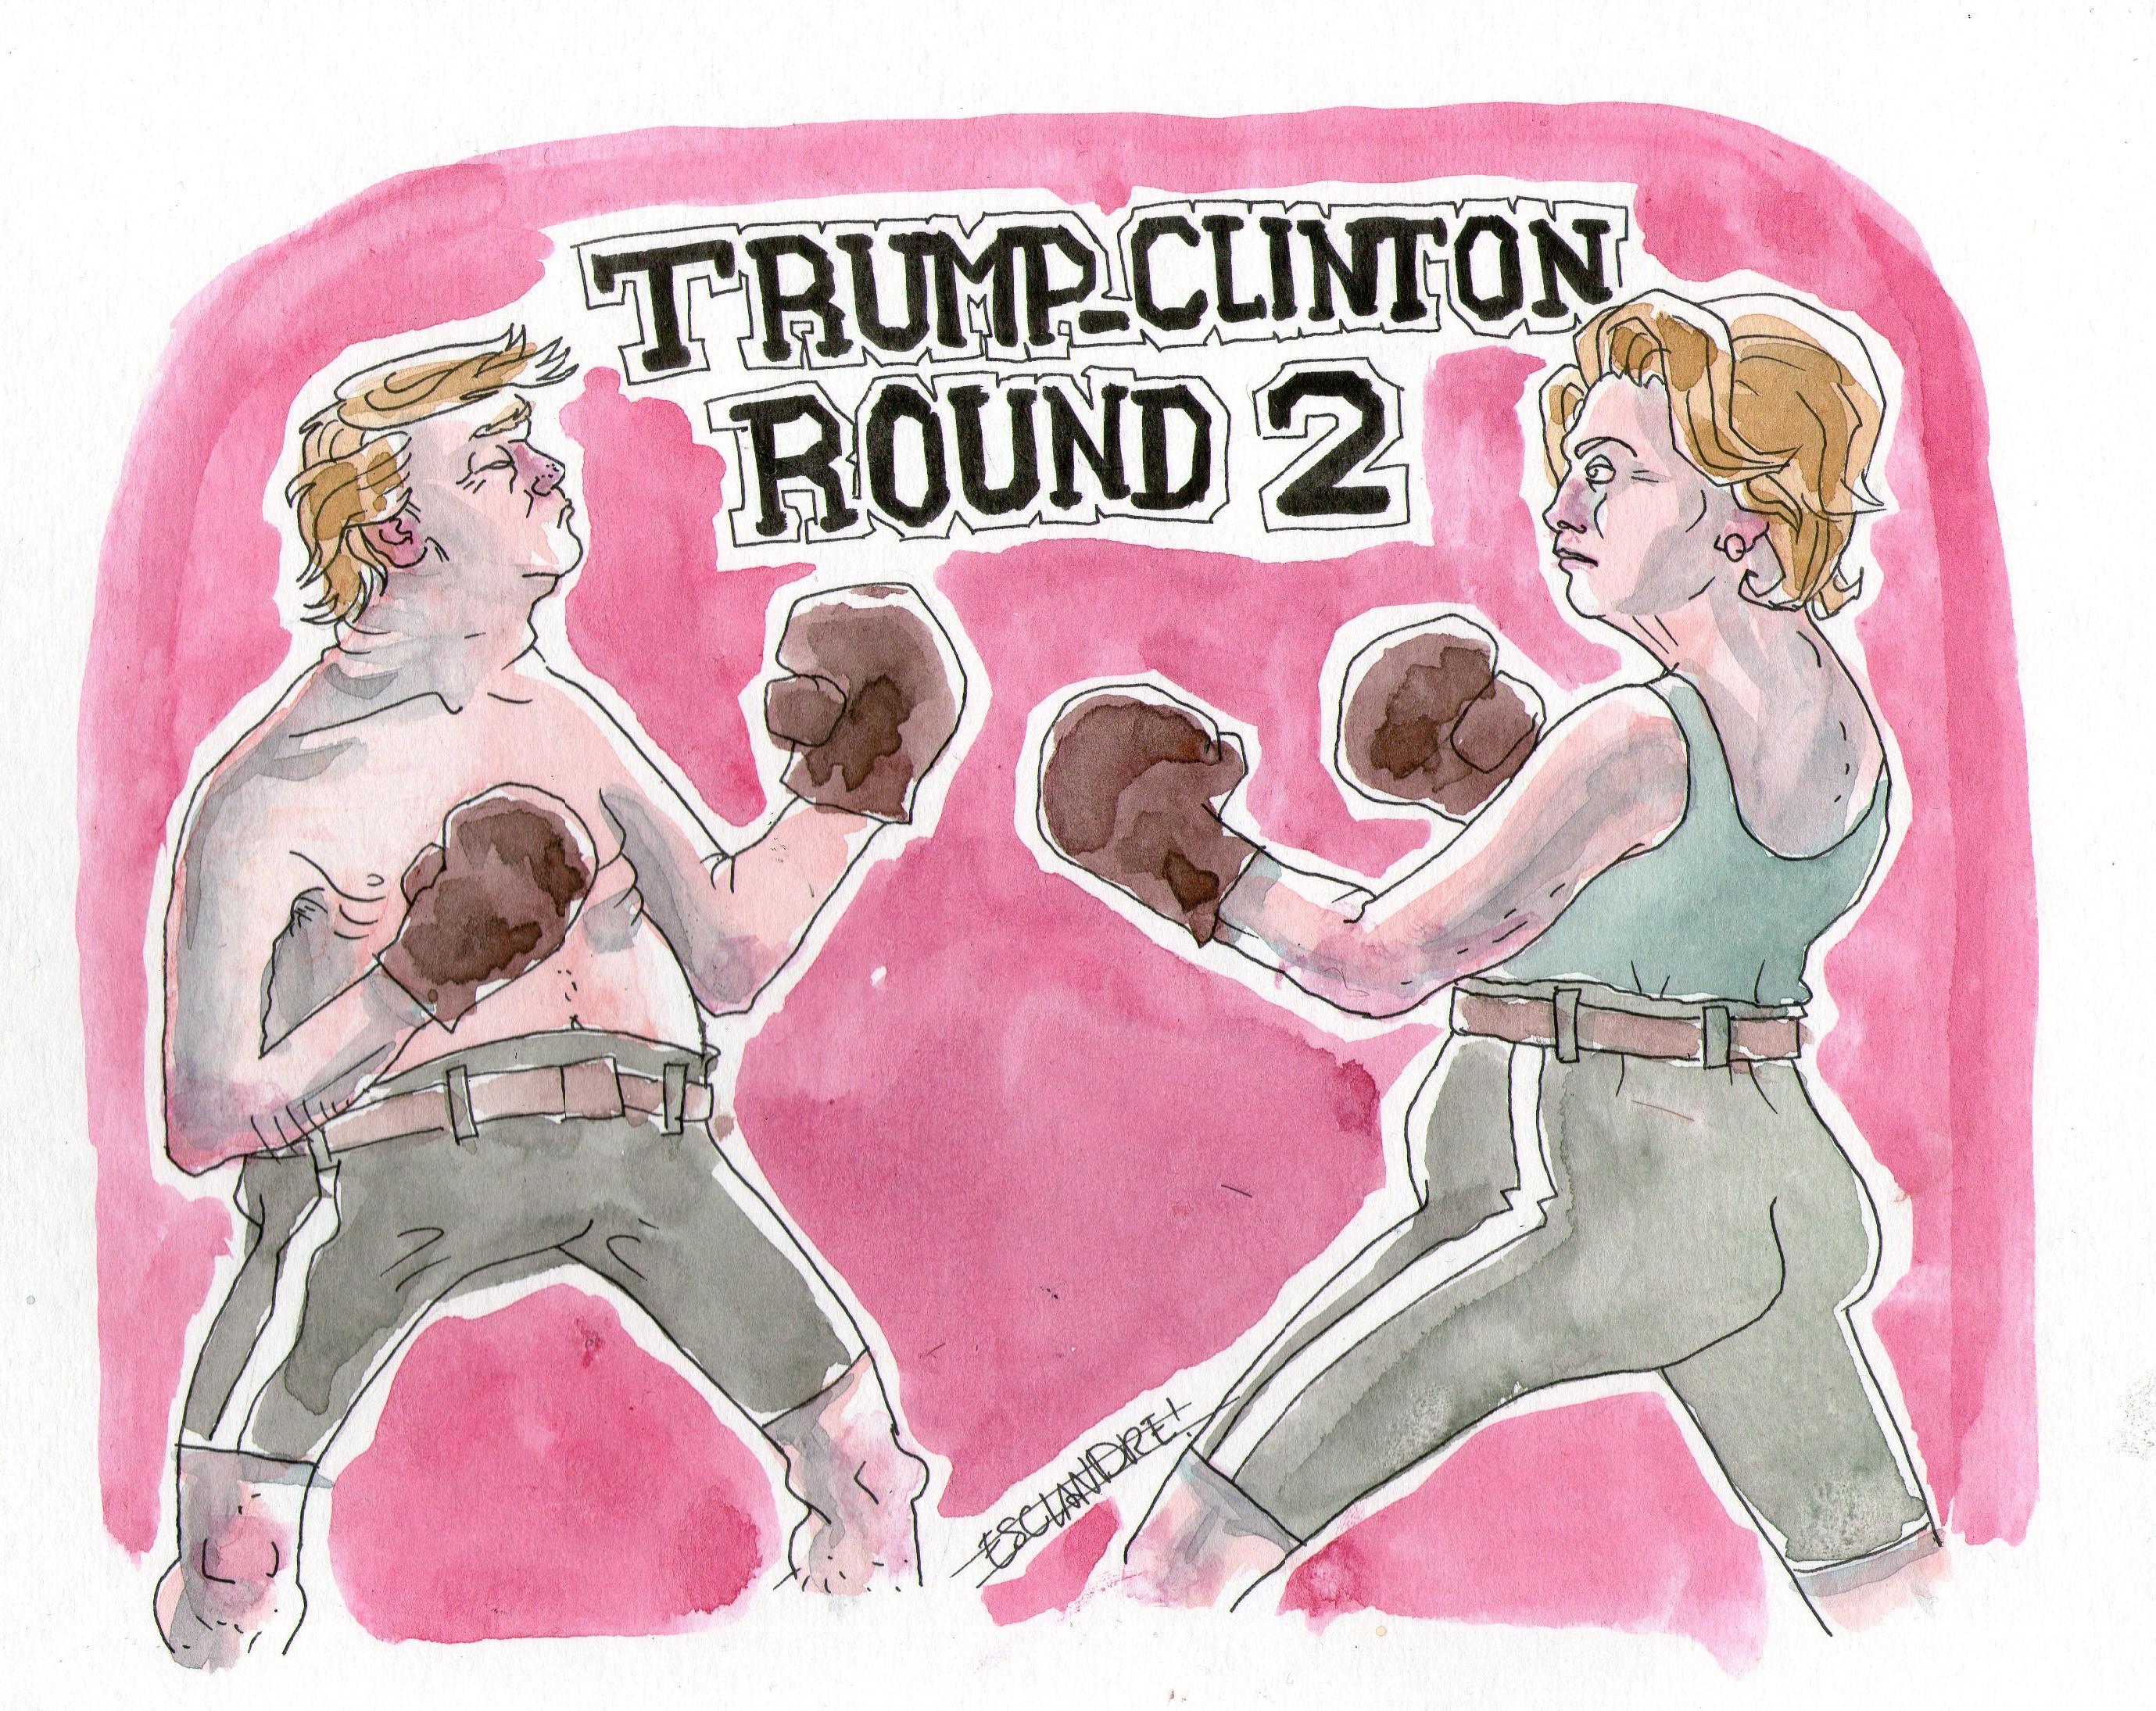 Trump – Clinton : Round 2